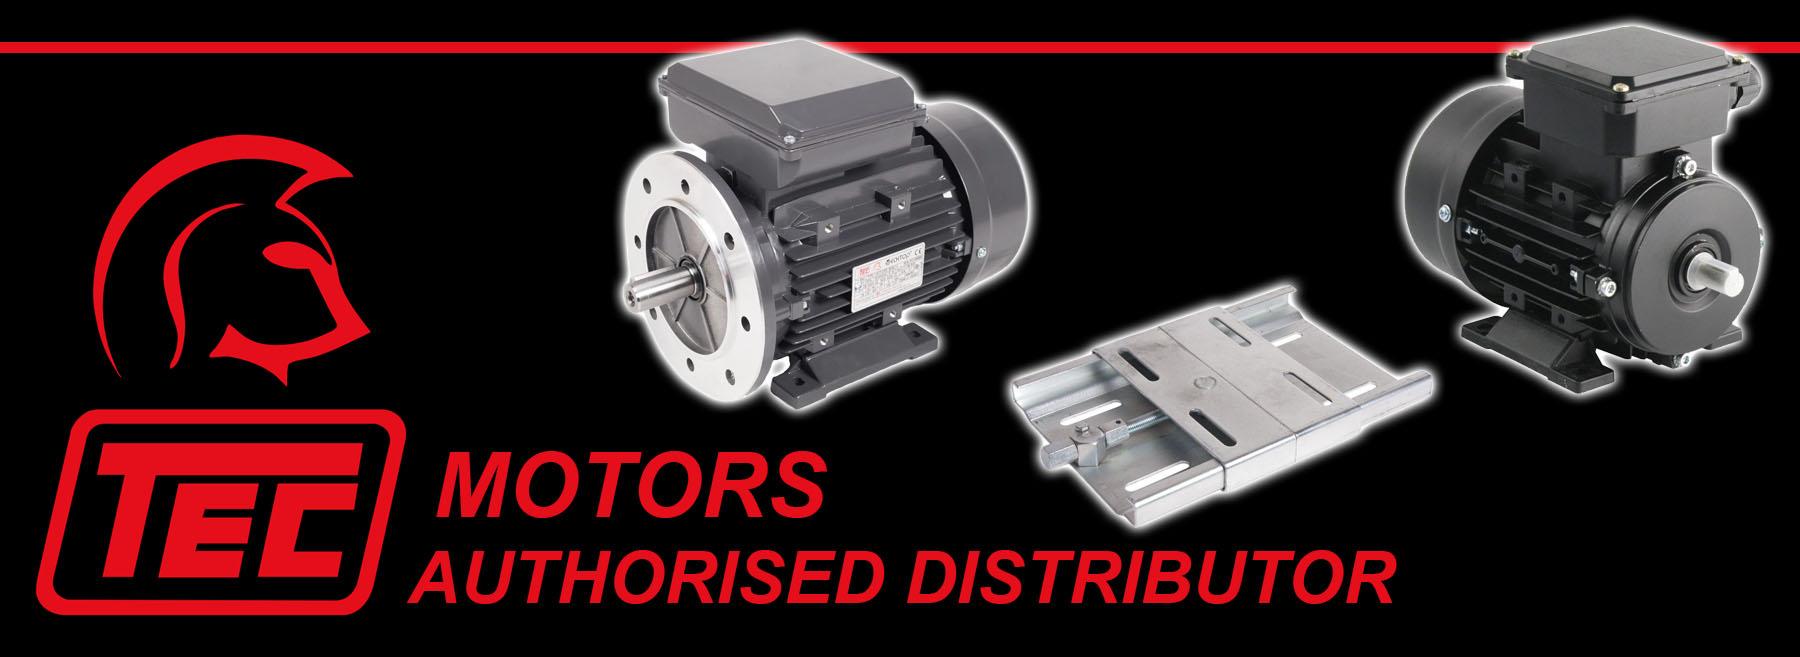 TEC Motors - Authorised Distributor